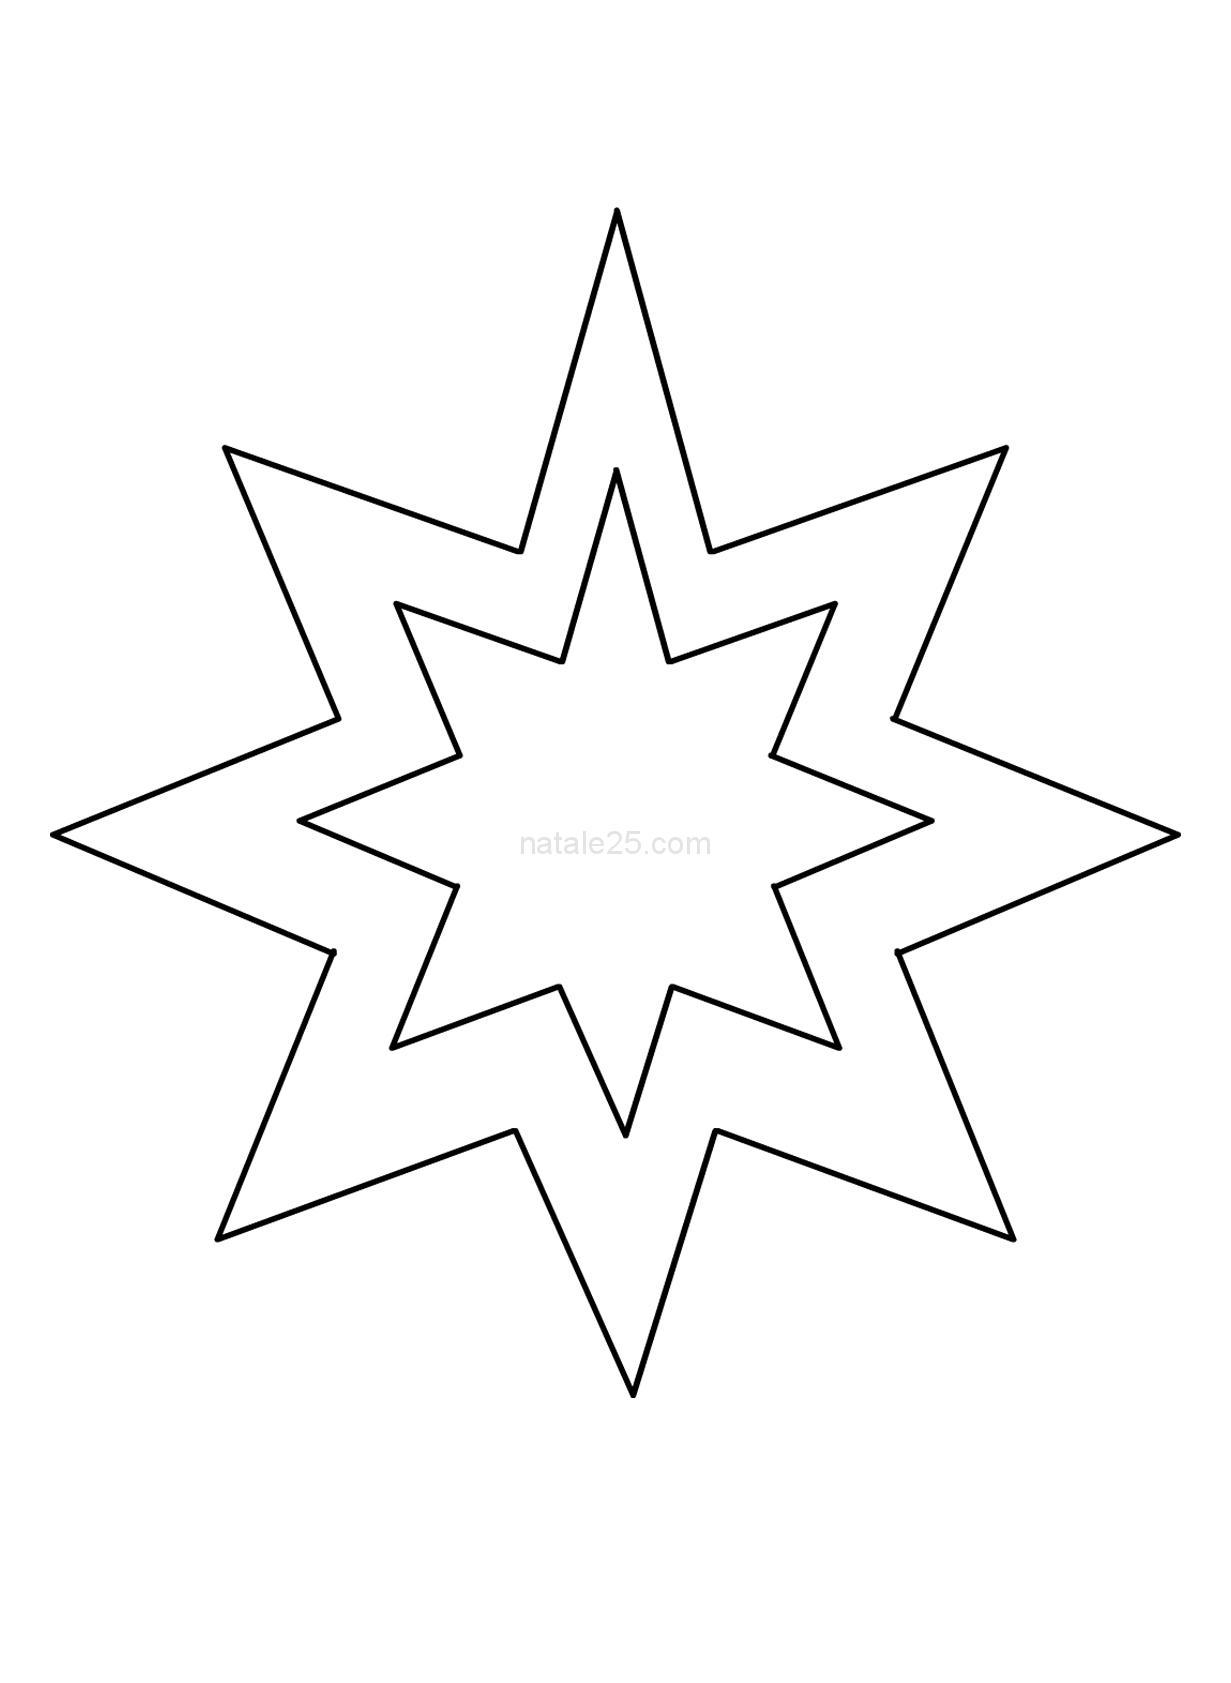 Sagoma stella 8 punte per addobbi